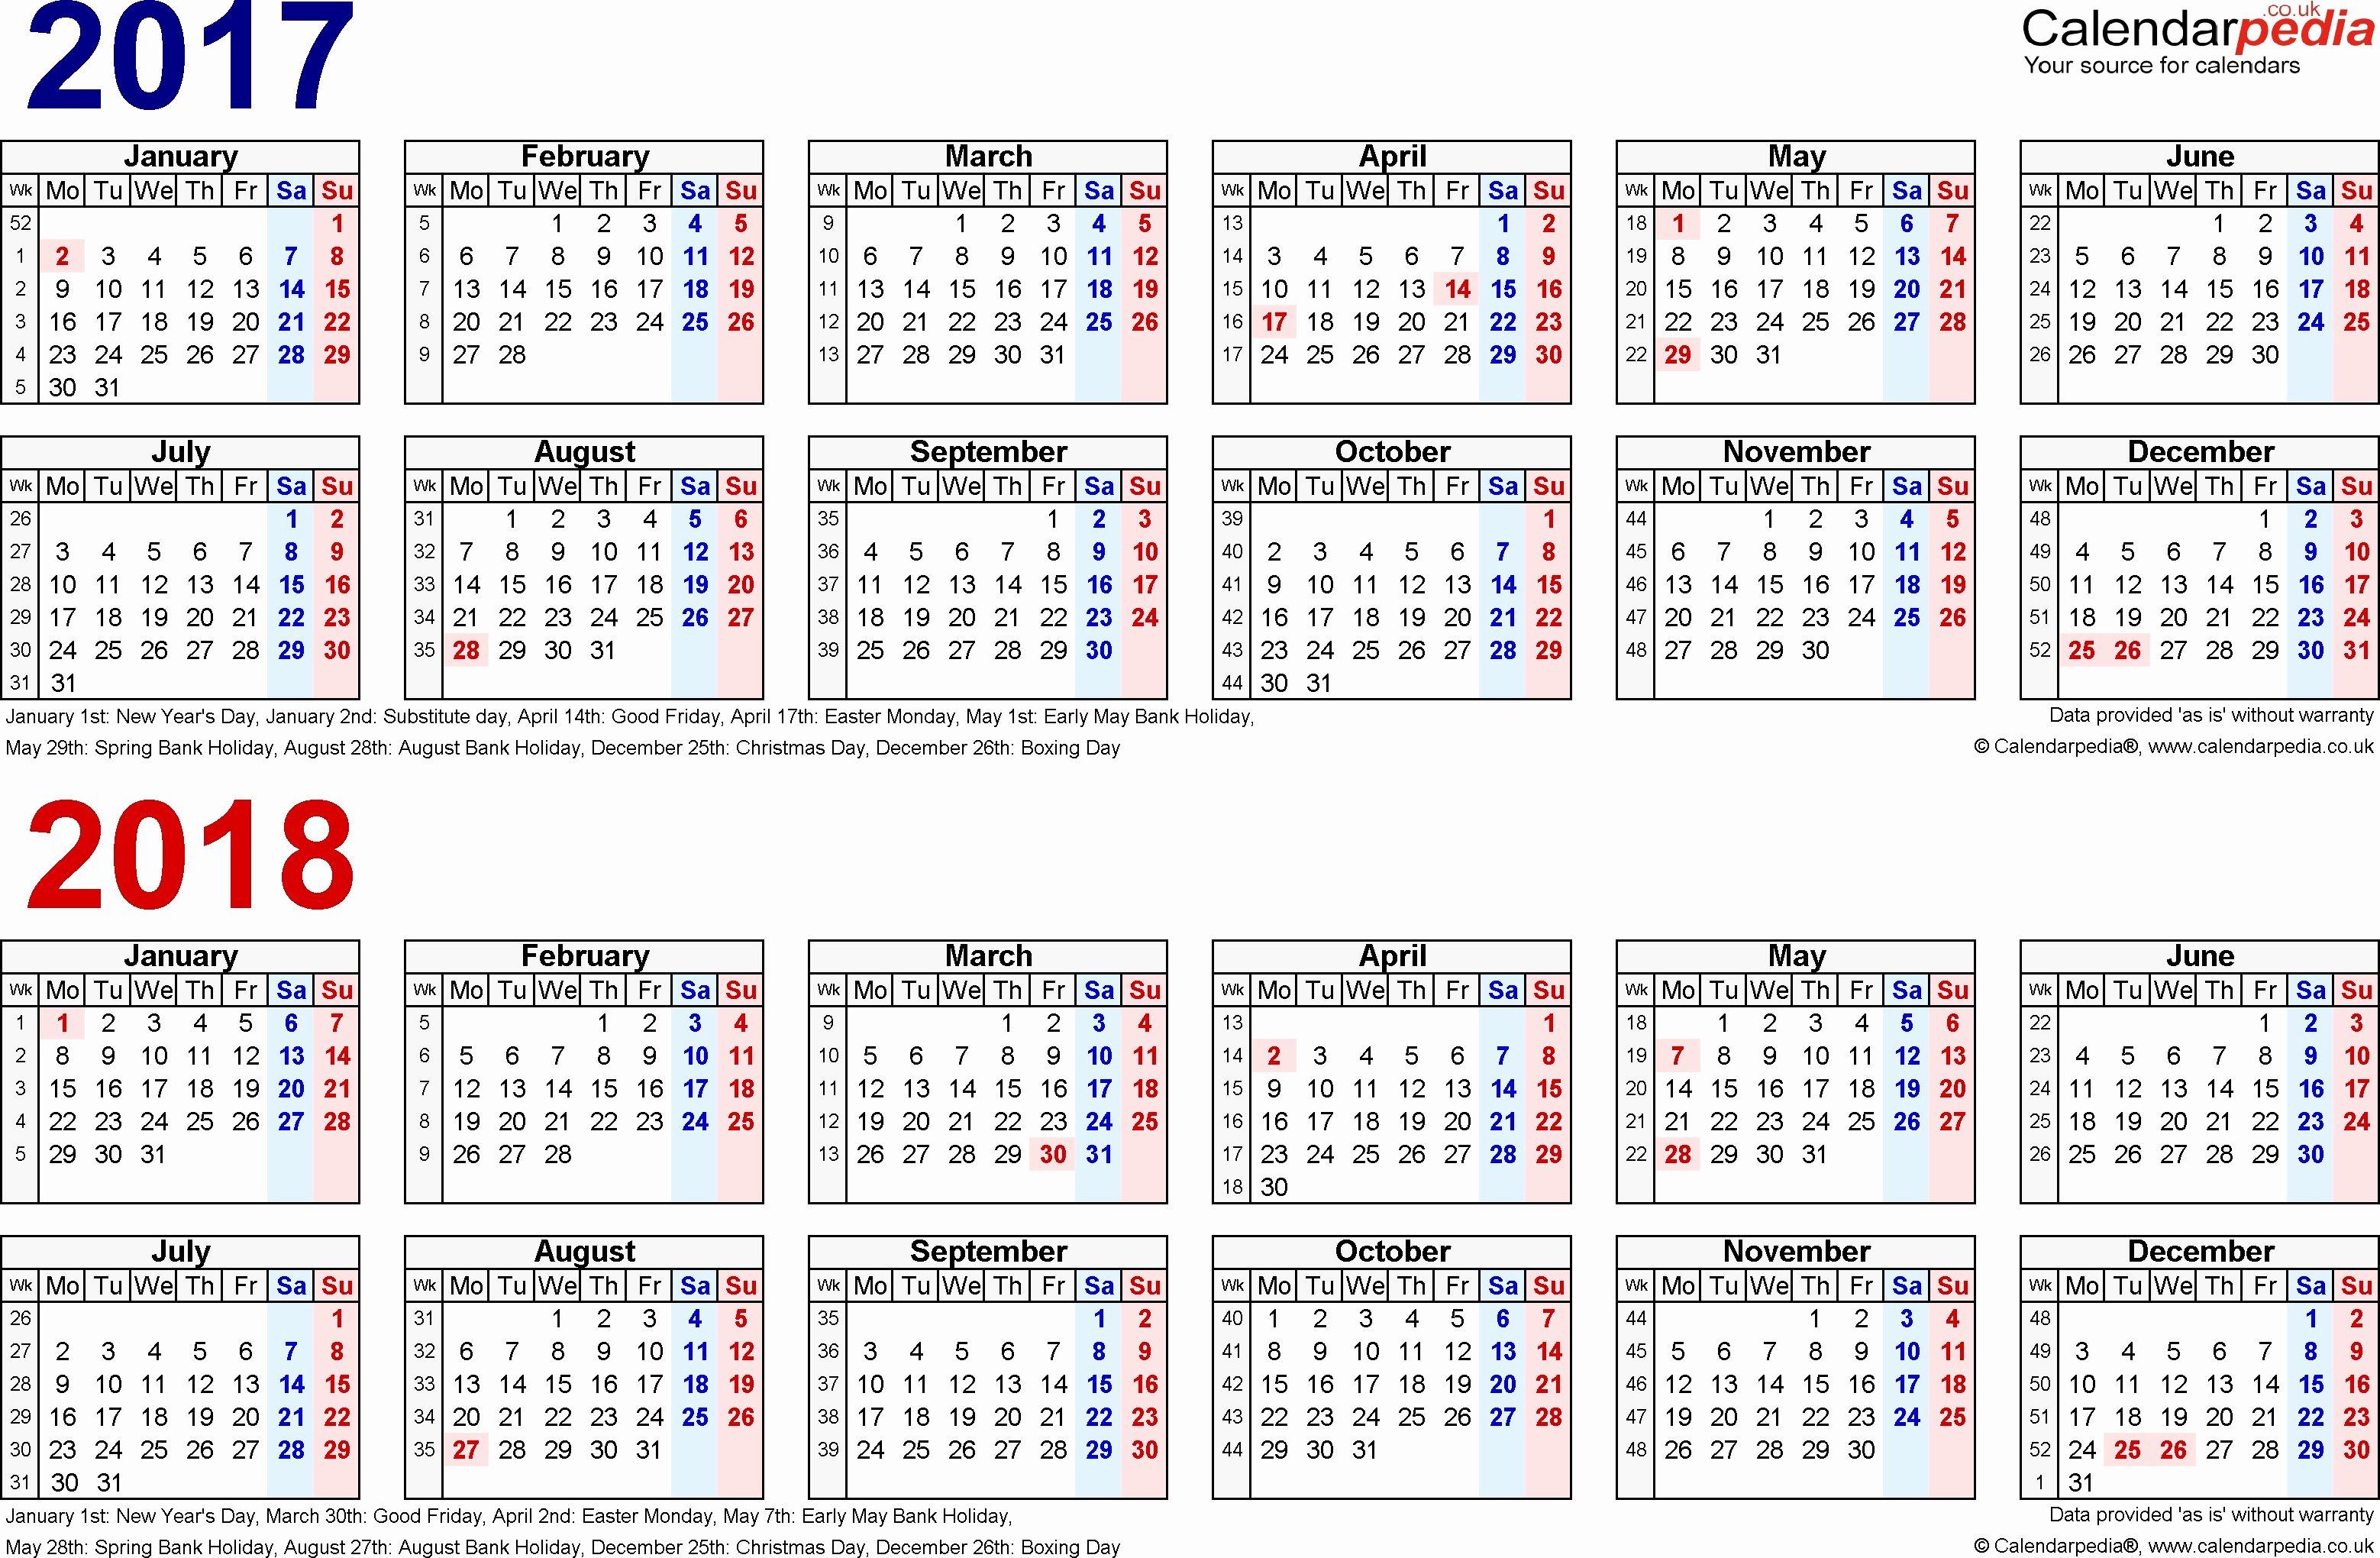 Excel Payroll Template 2019 Fresh 2018 Payroll Calendar Printable